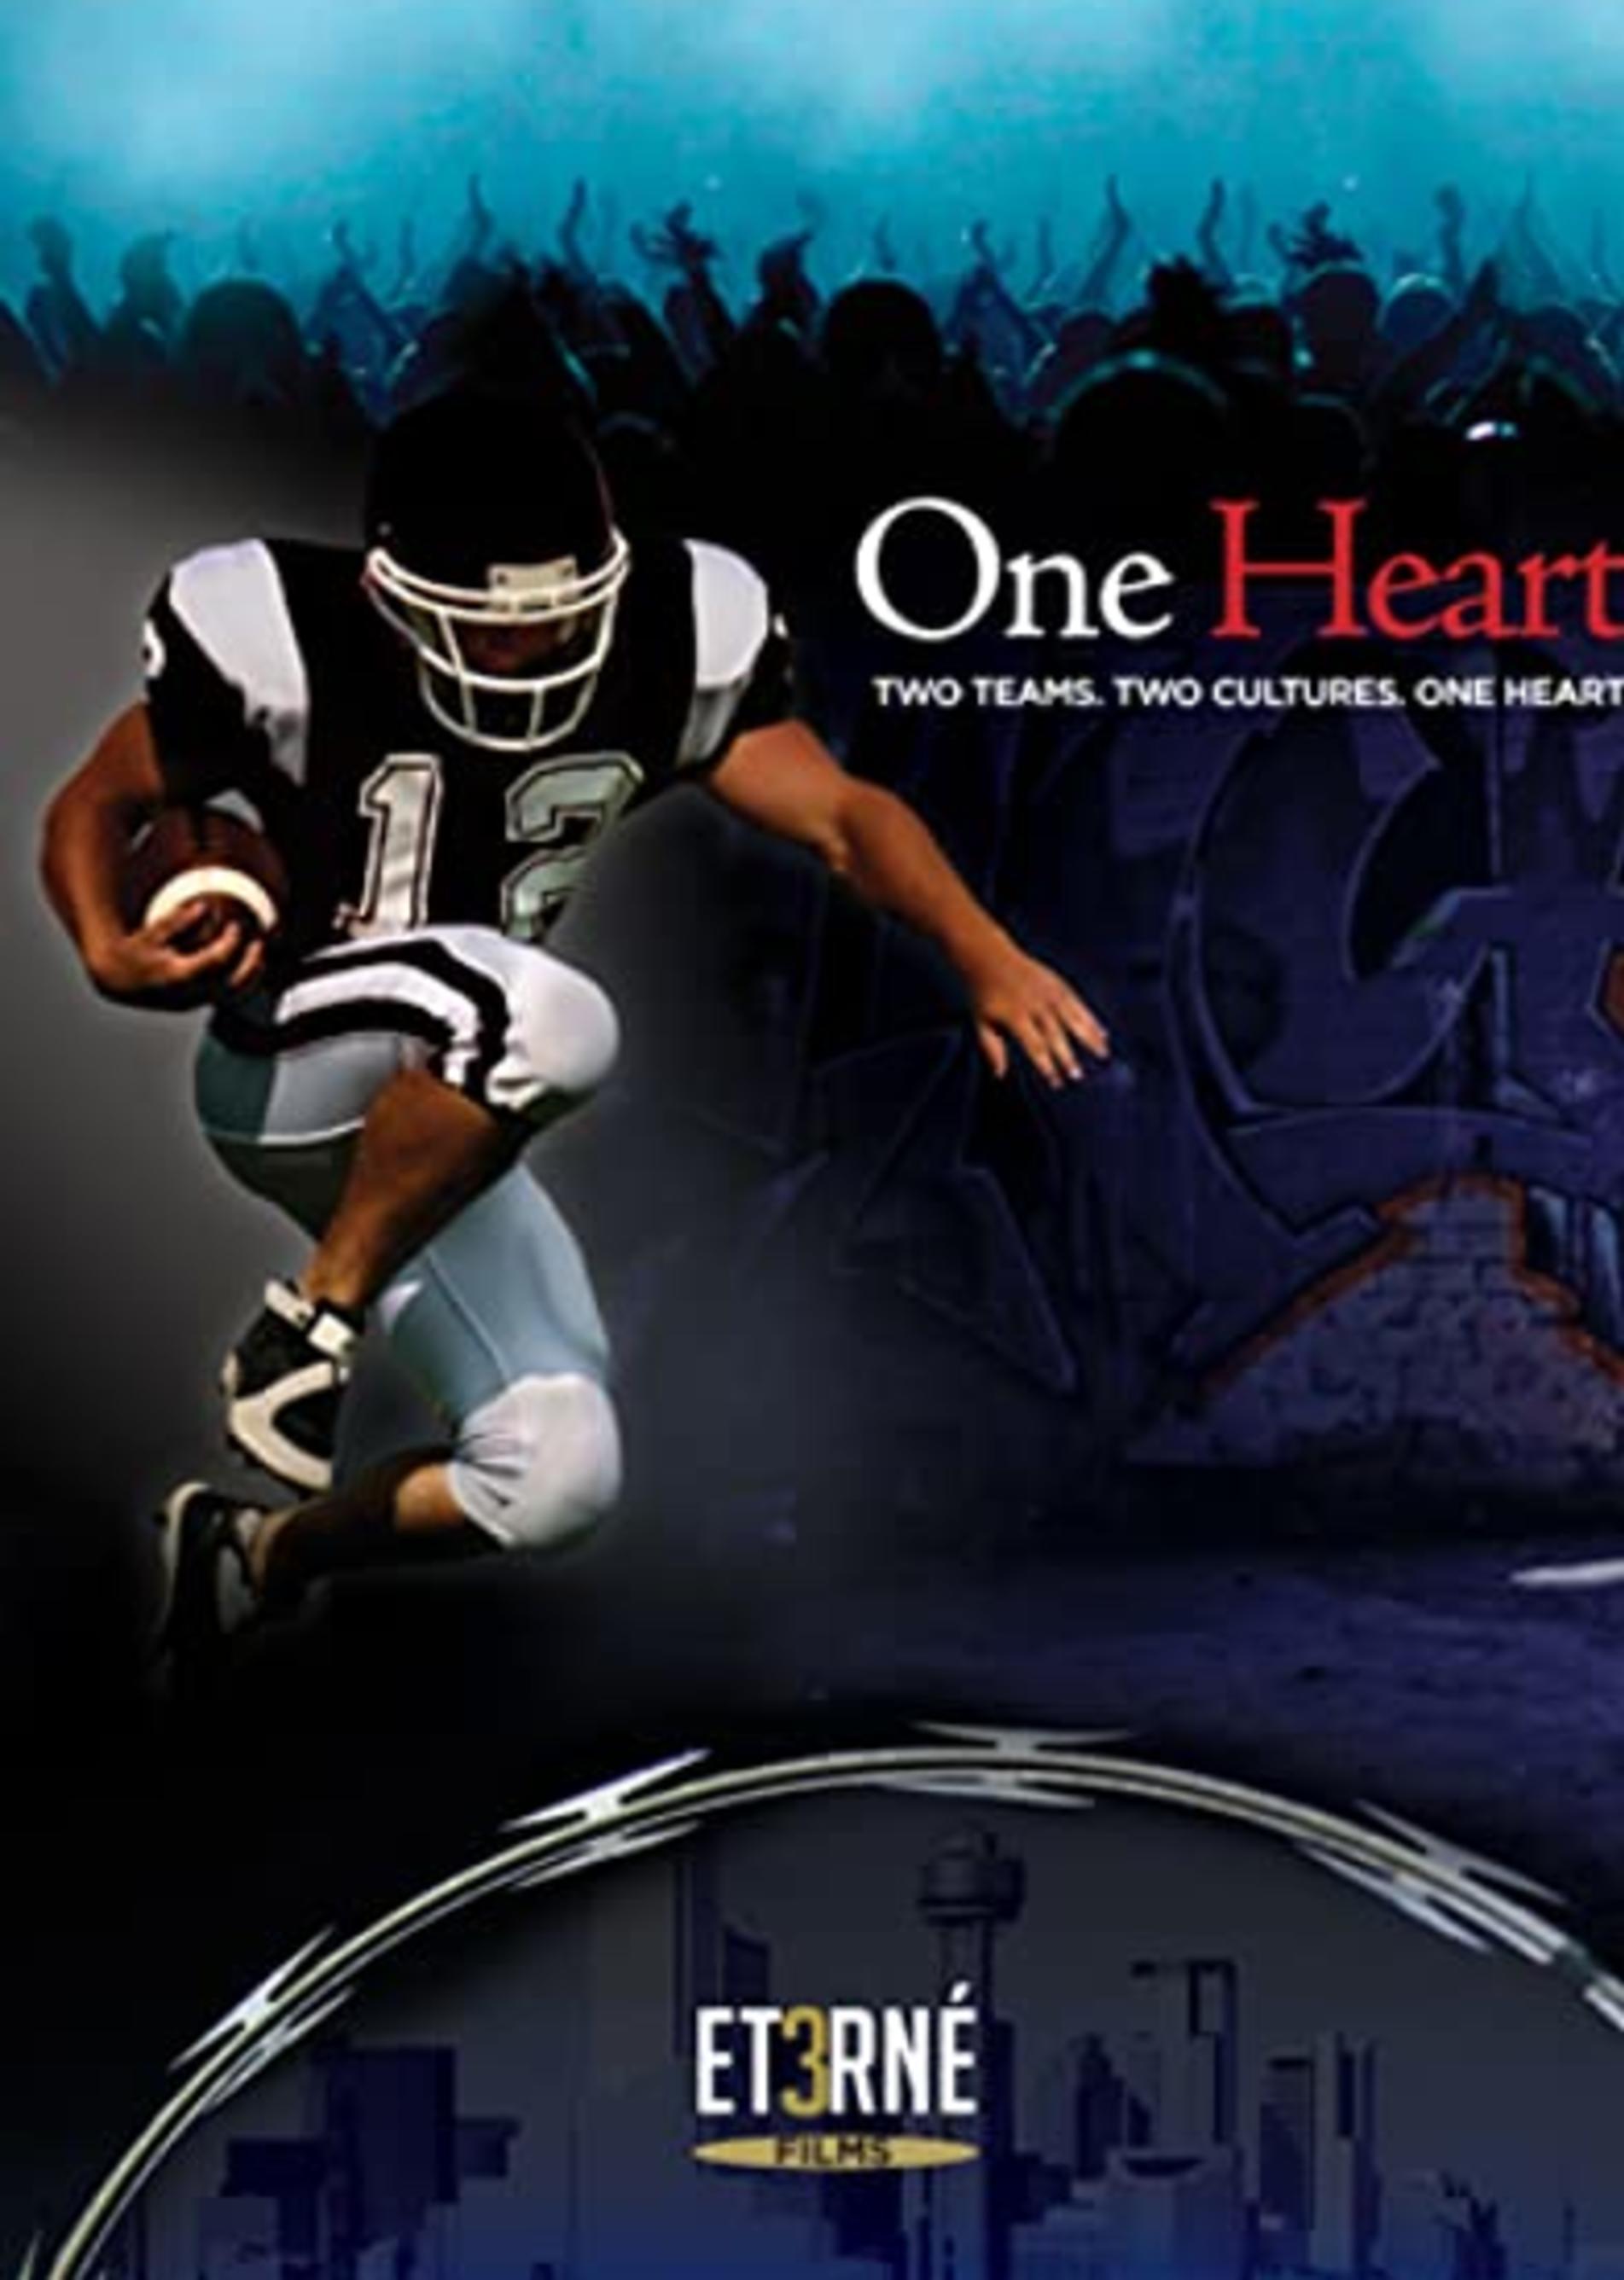 One Heart Film